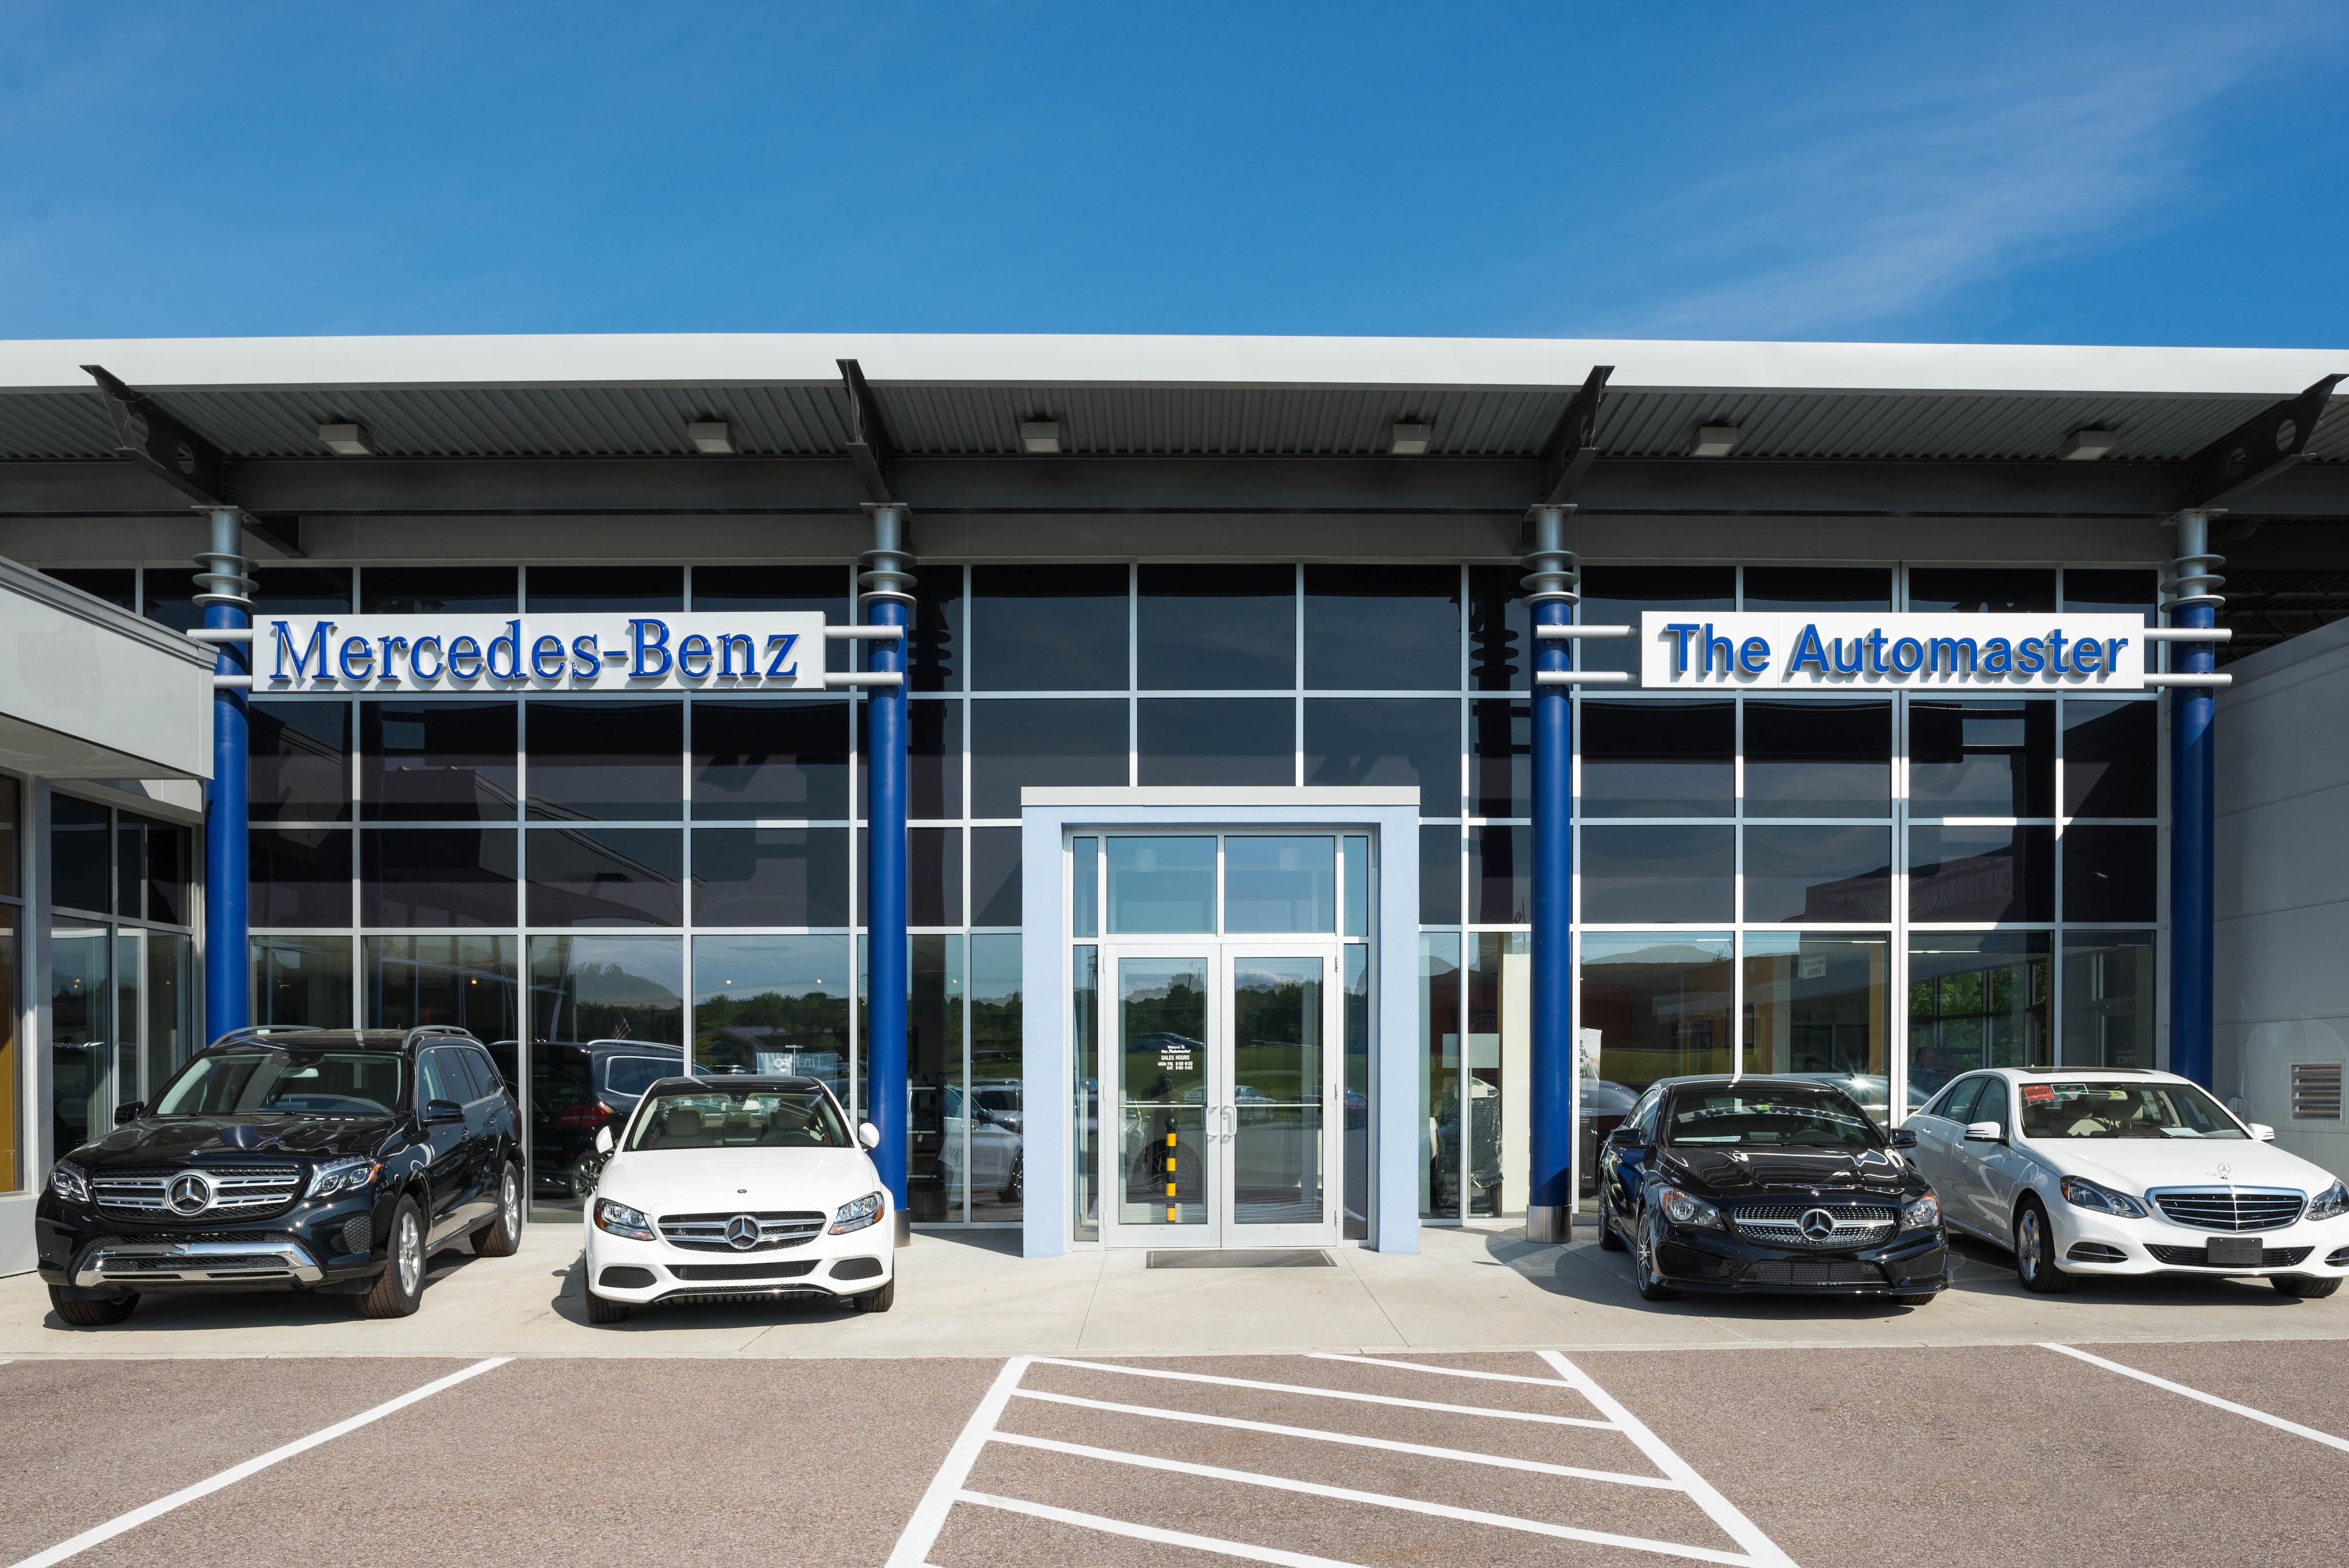 used of benz az redesign disclaimer mercedes gilbert cars dealership botb dealer